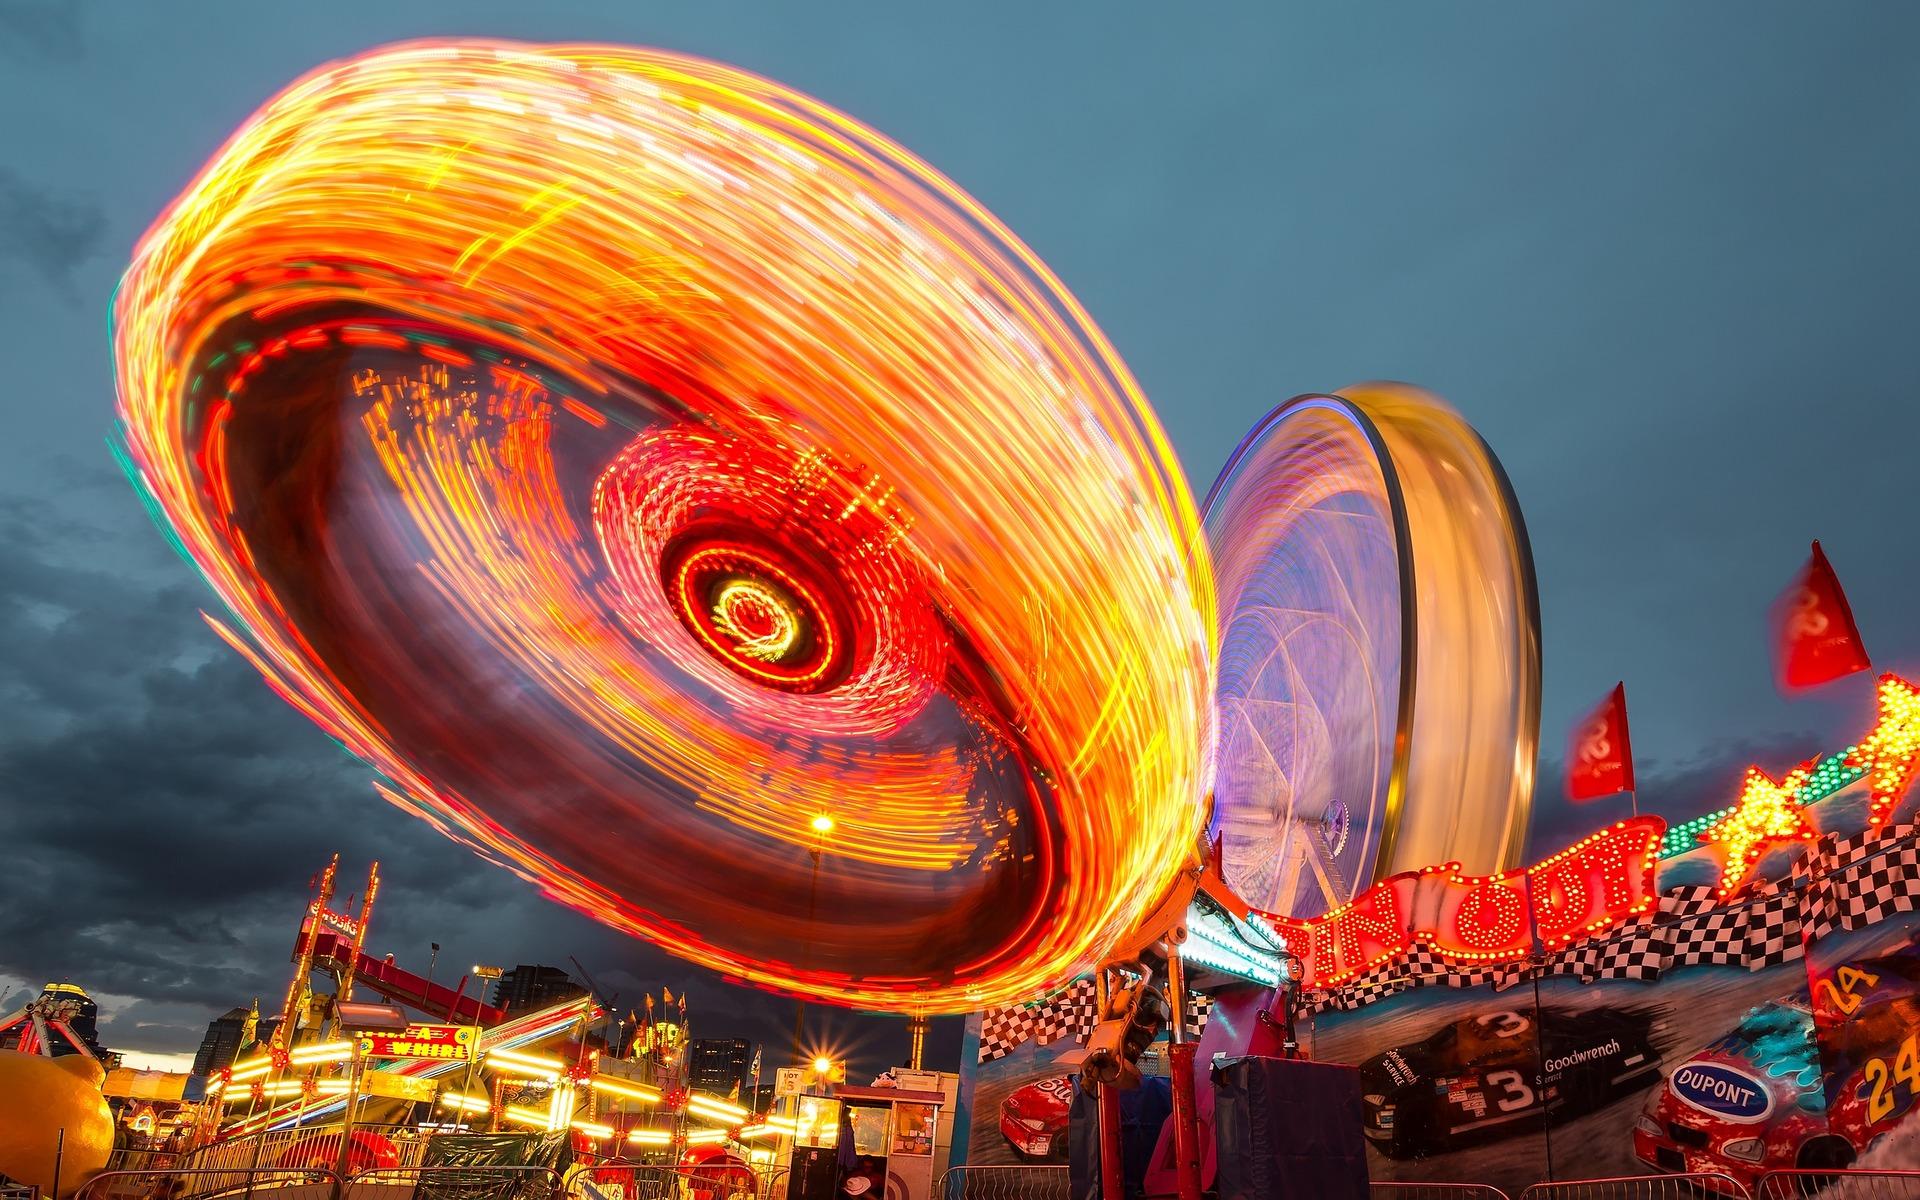 fairground-1149626_1920